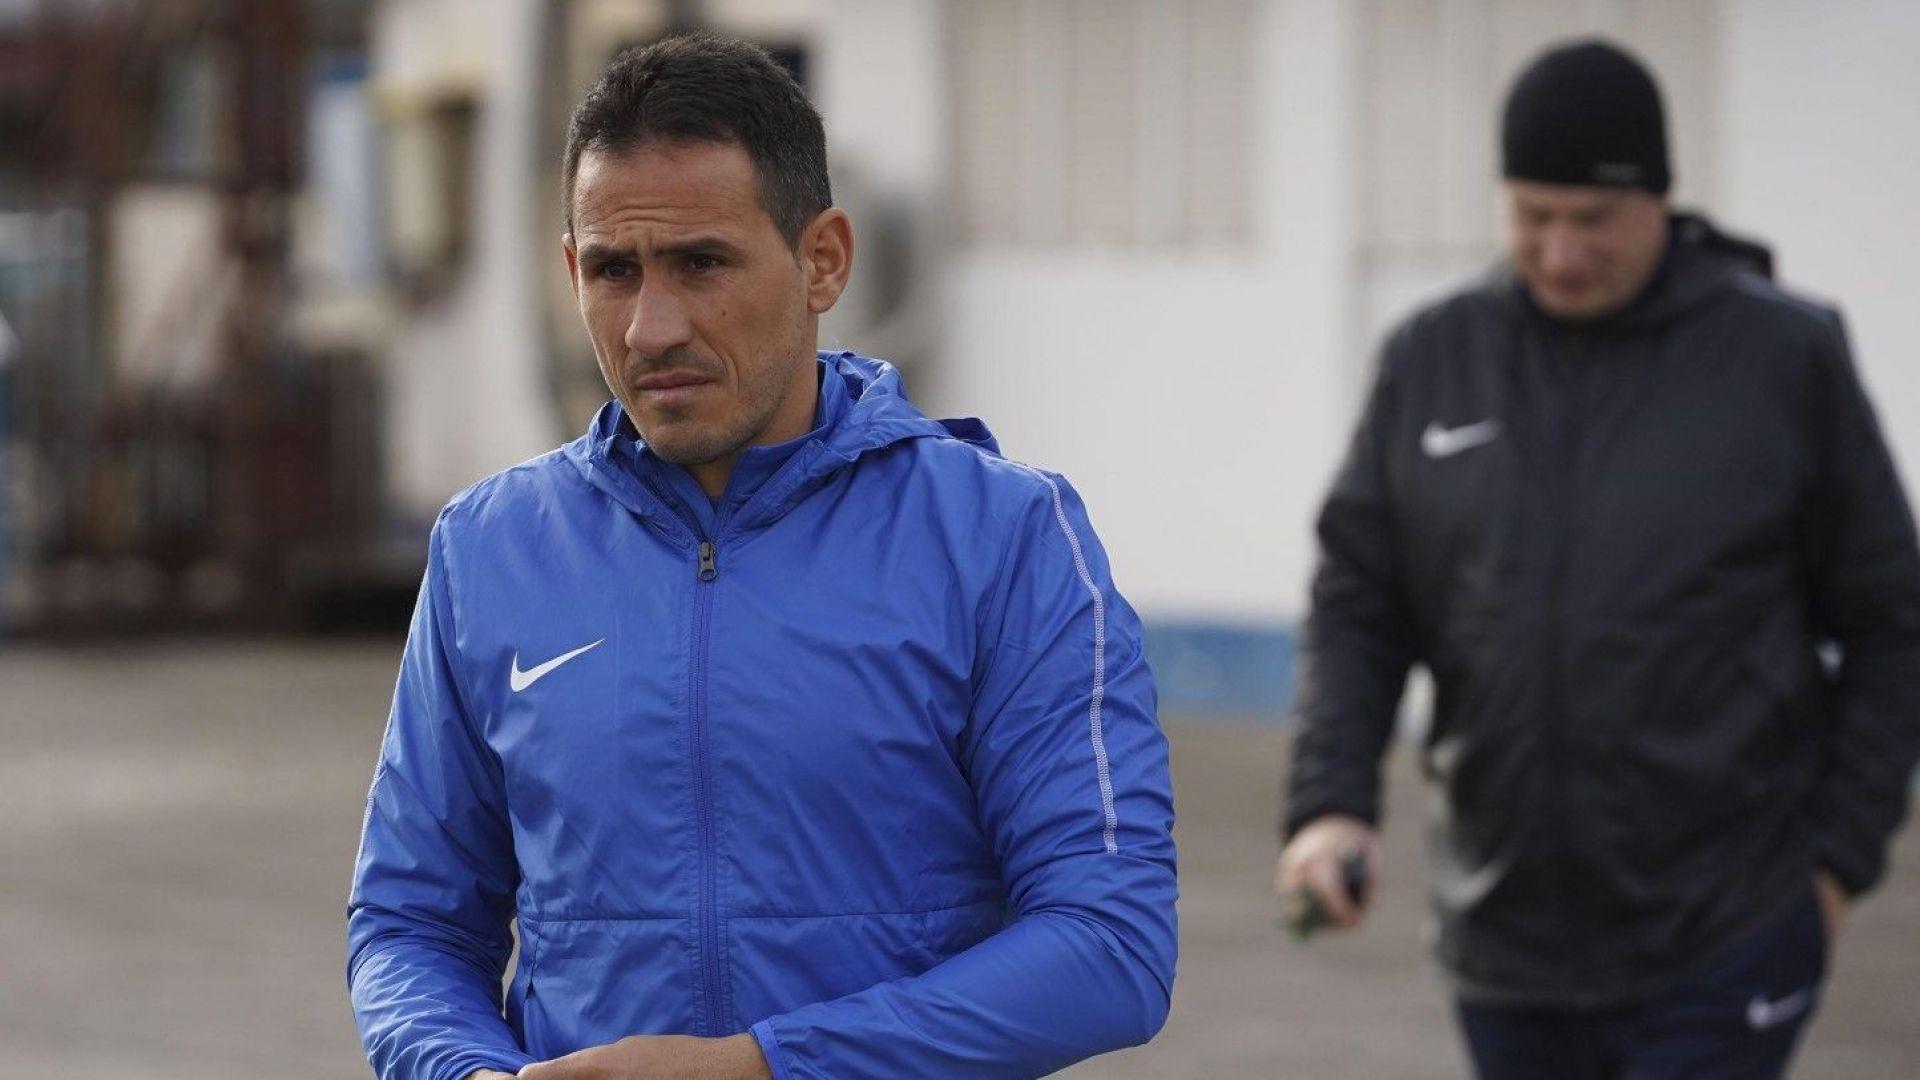 БФС забрани на капитана на Левски да играе срещу Лудогорец